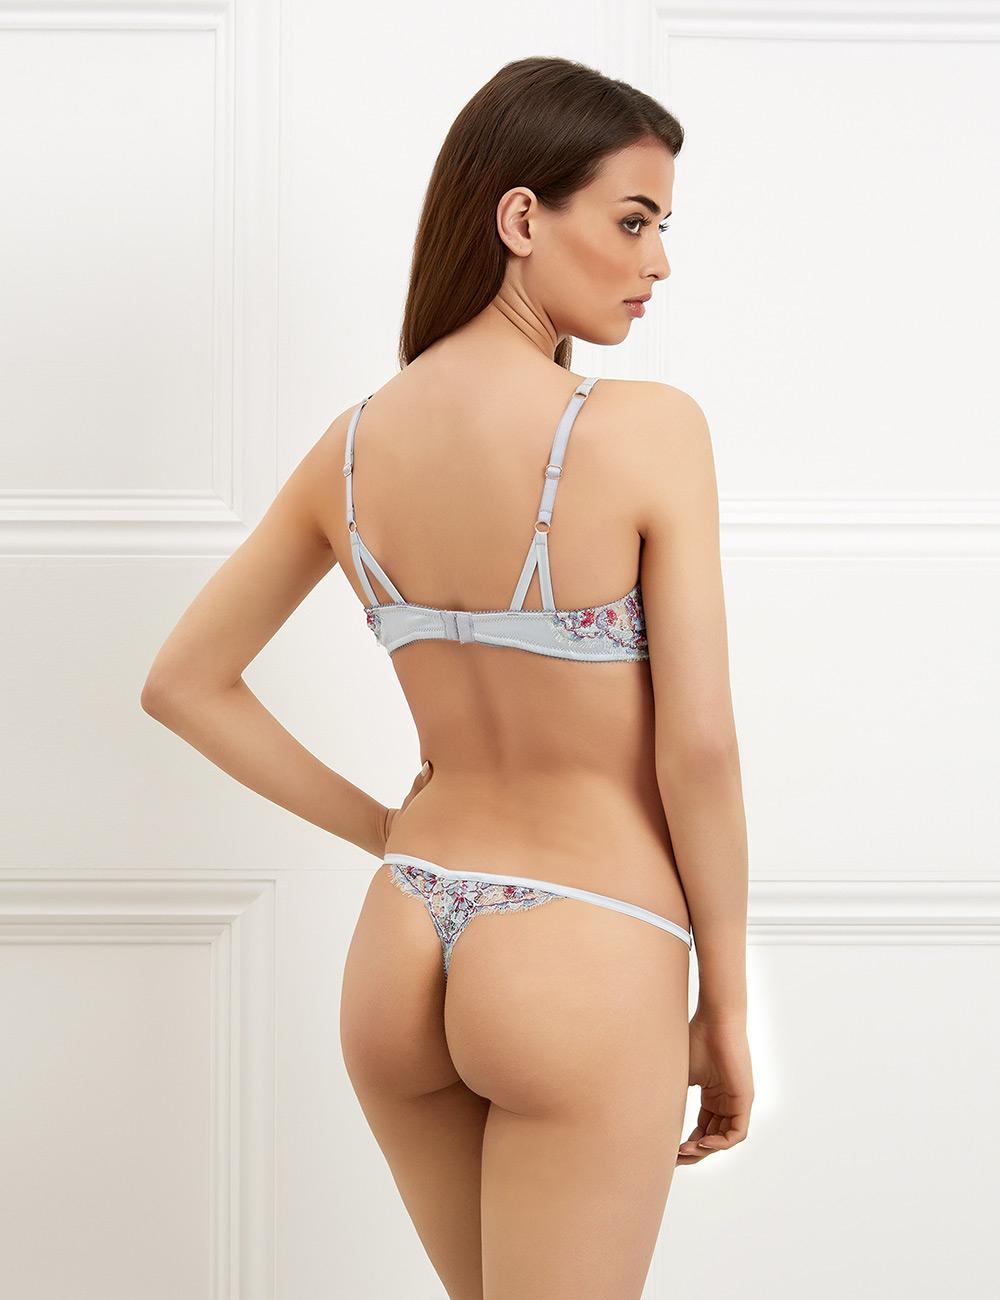 Lettal young garl underwear pussy sexy